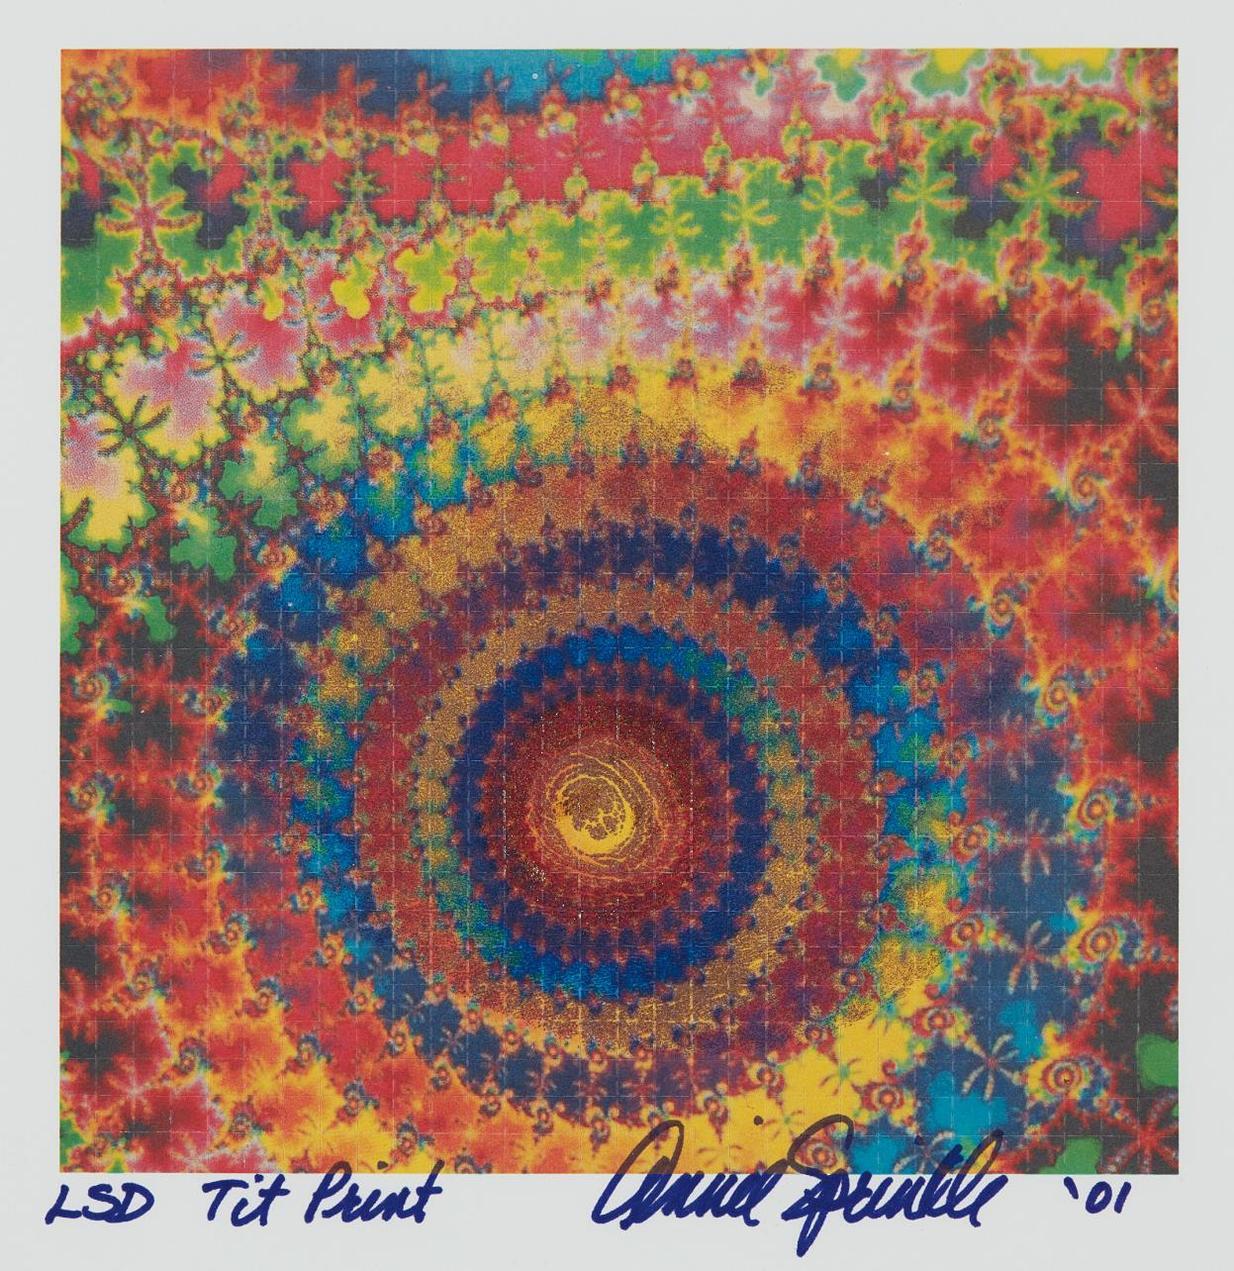 Annie Sprinkle - Lsd Tit Print-2001